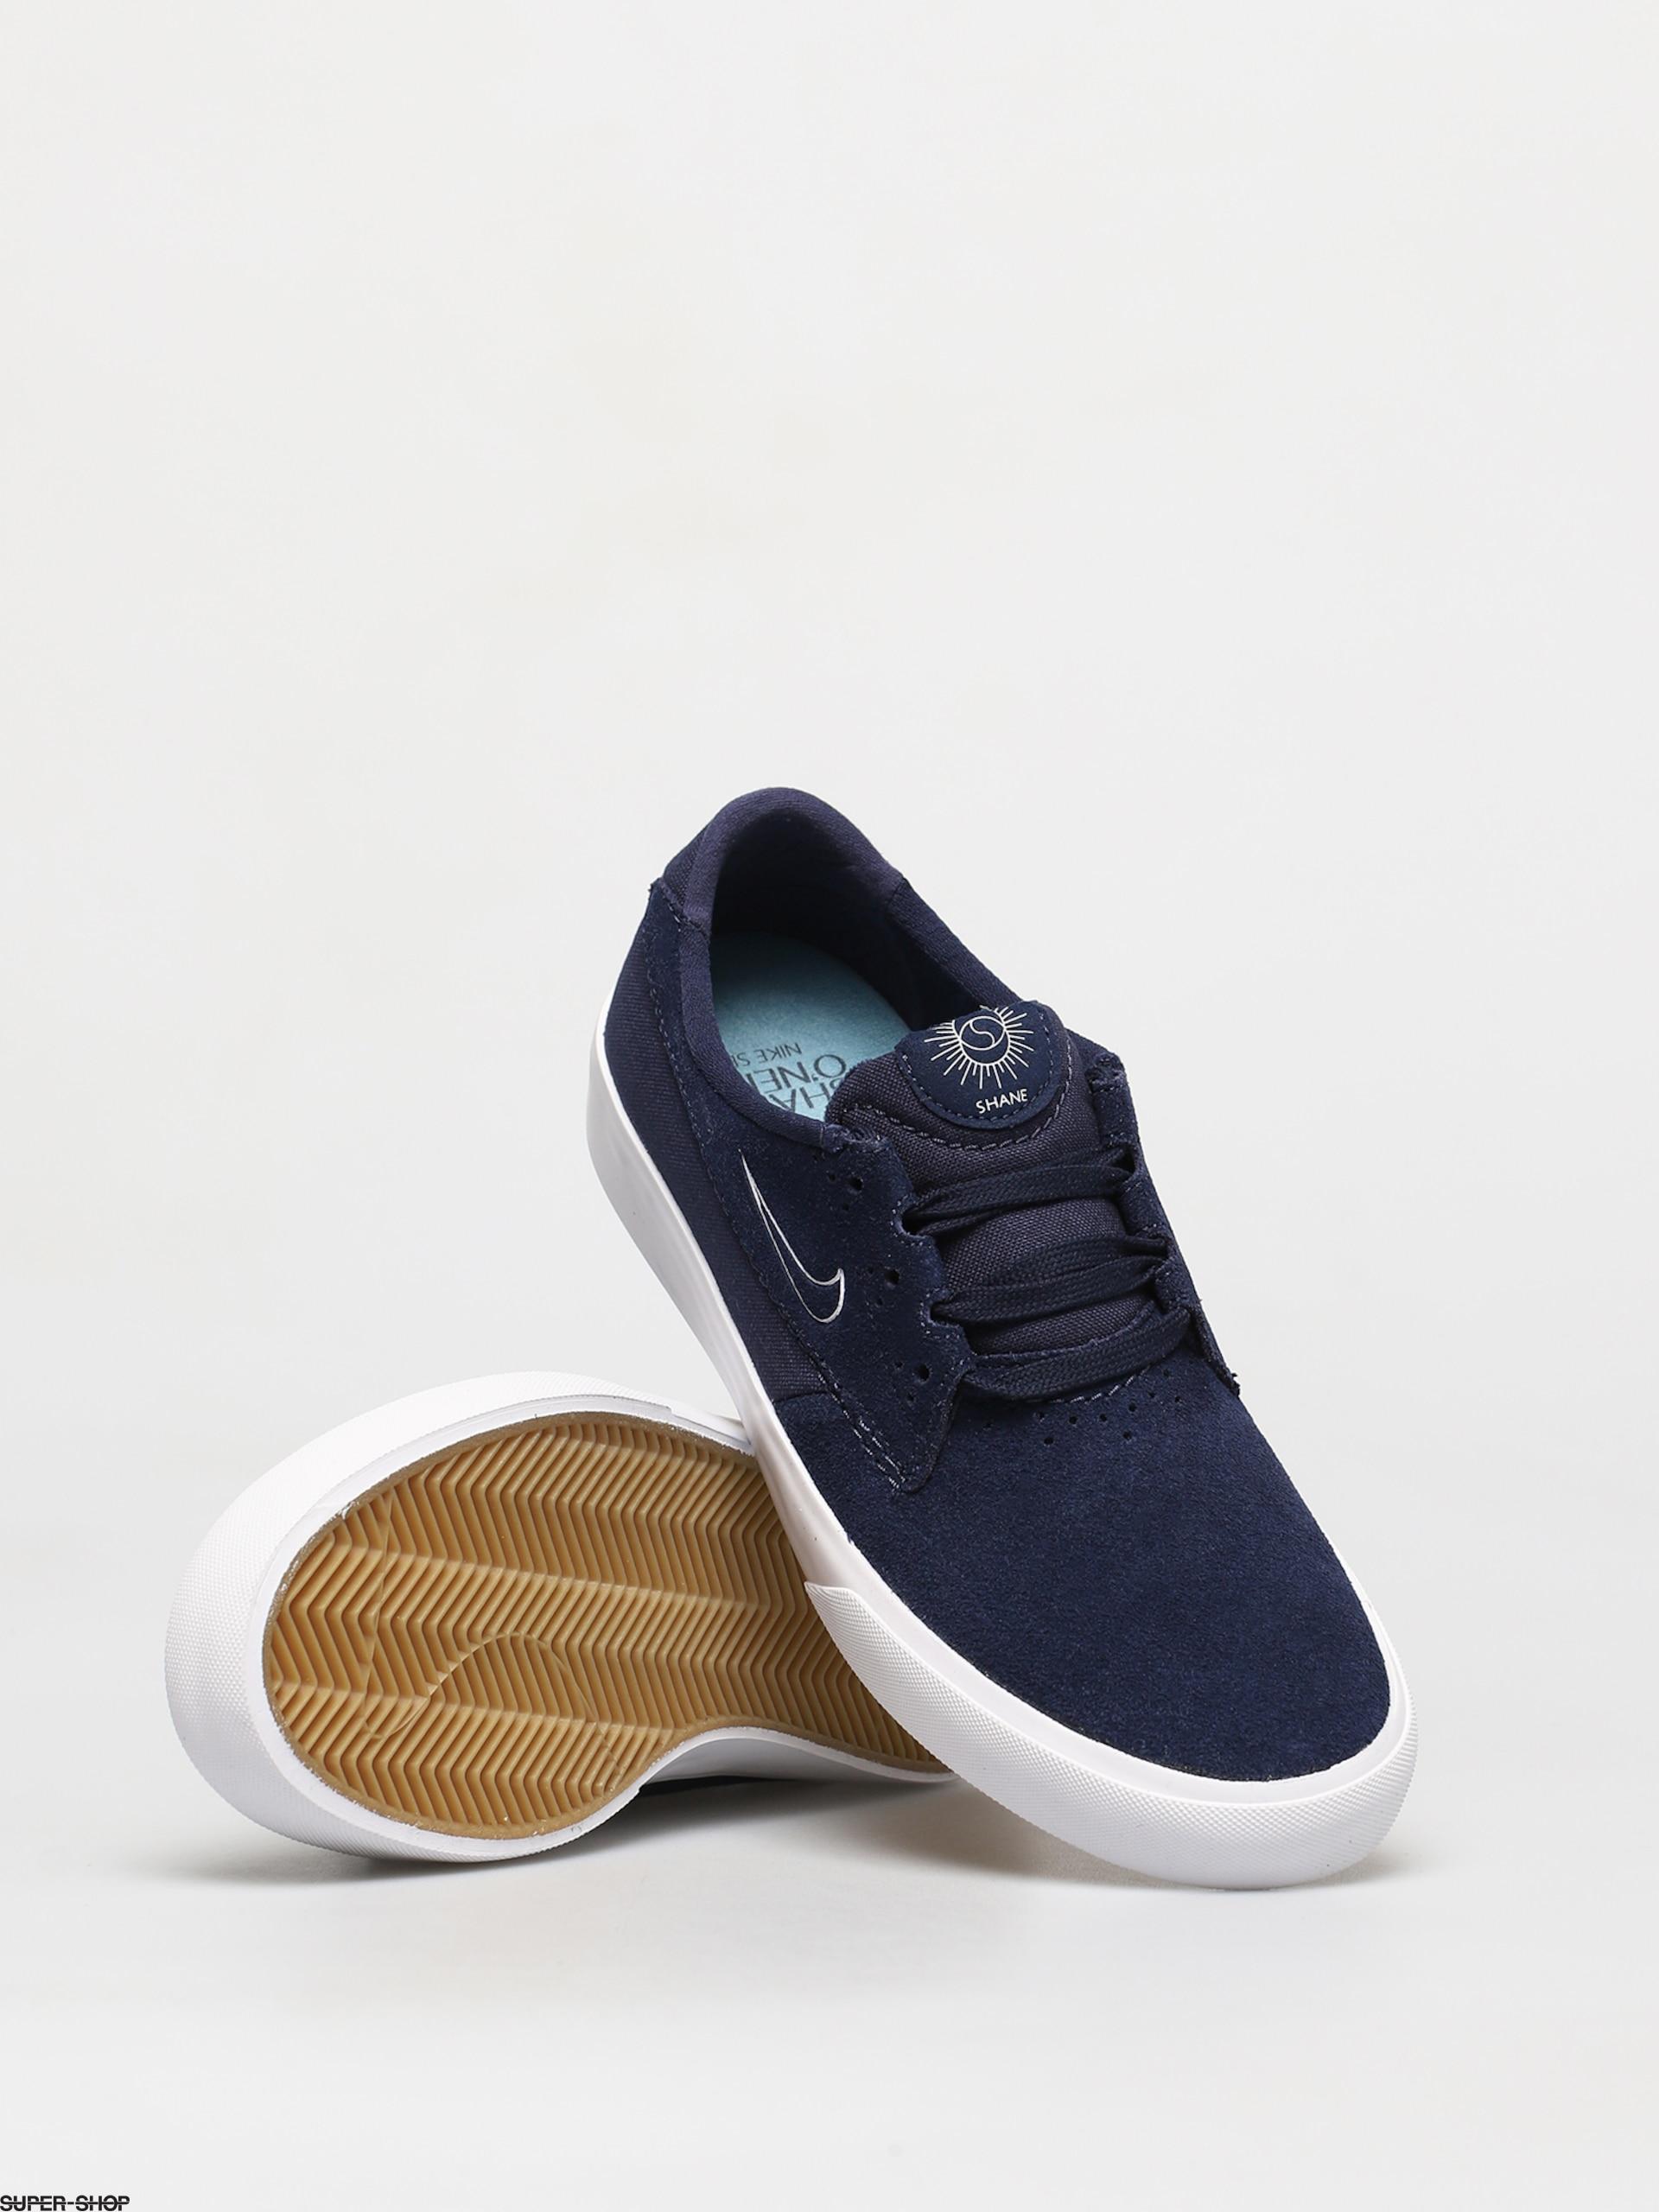 Nike SB Shane Shoes (midnight navy/white cerulean)